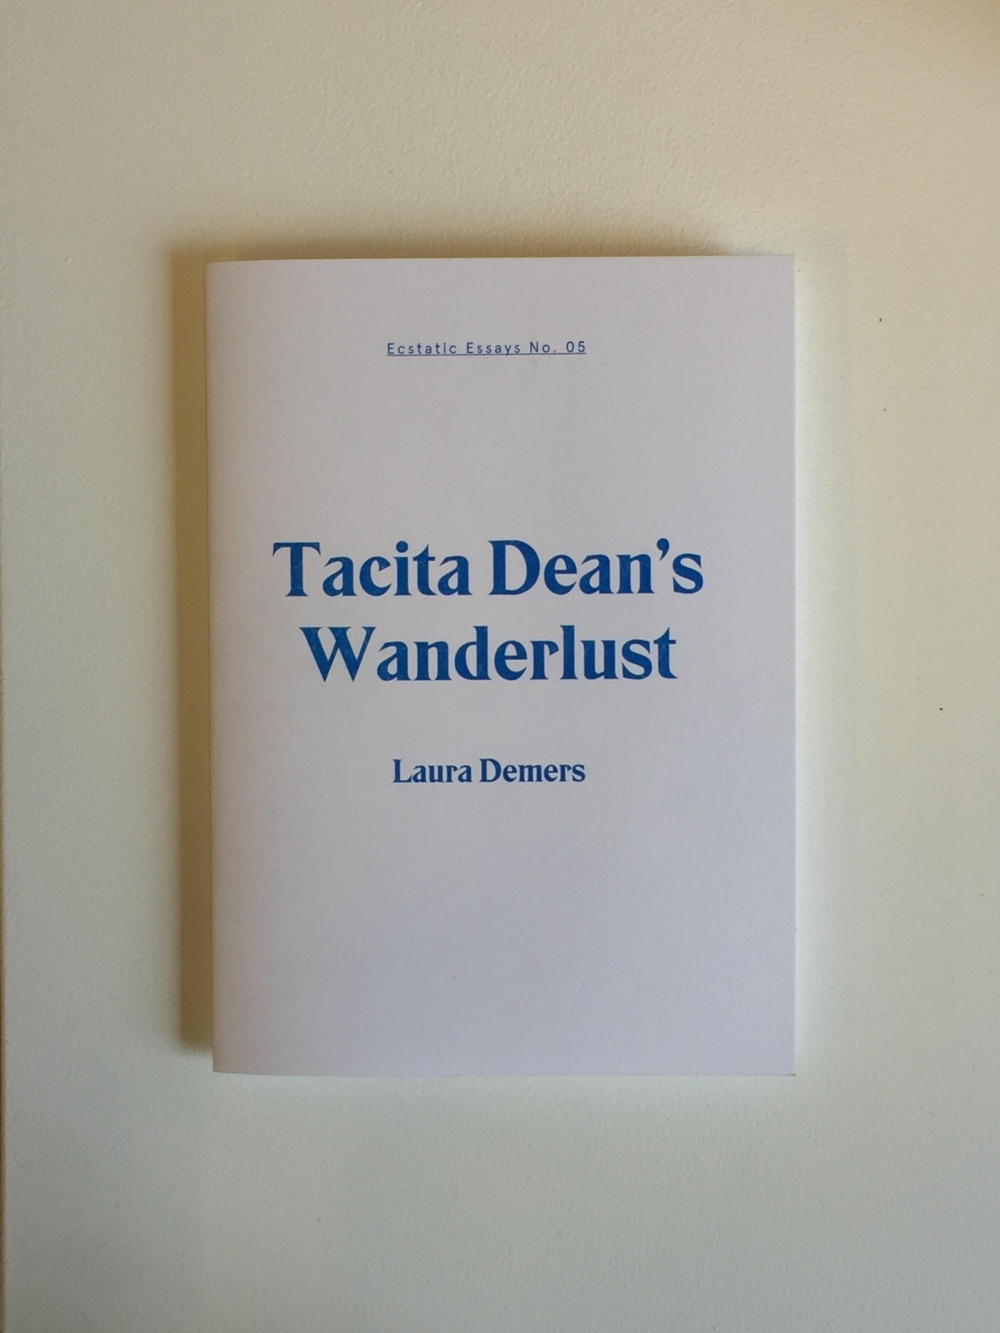 Tacita Dean's Wanderlust